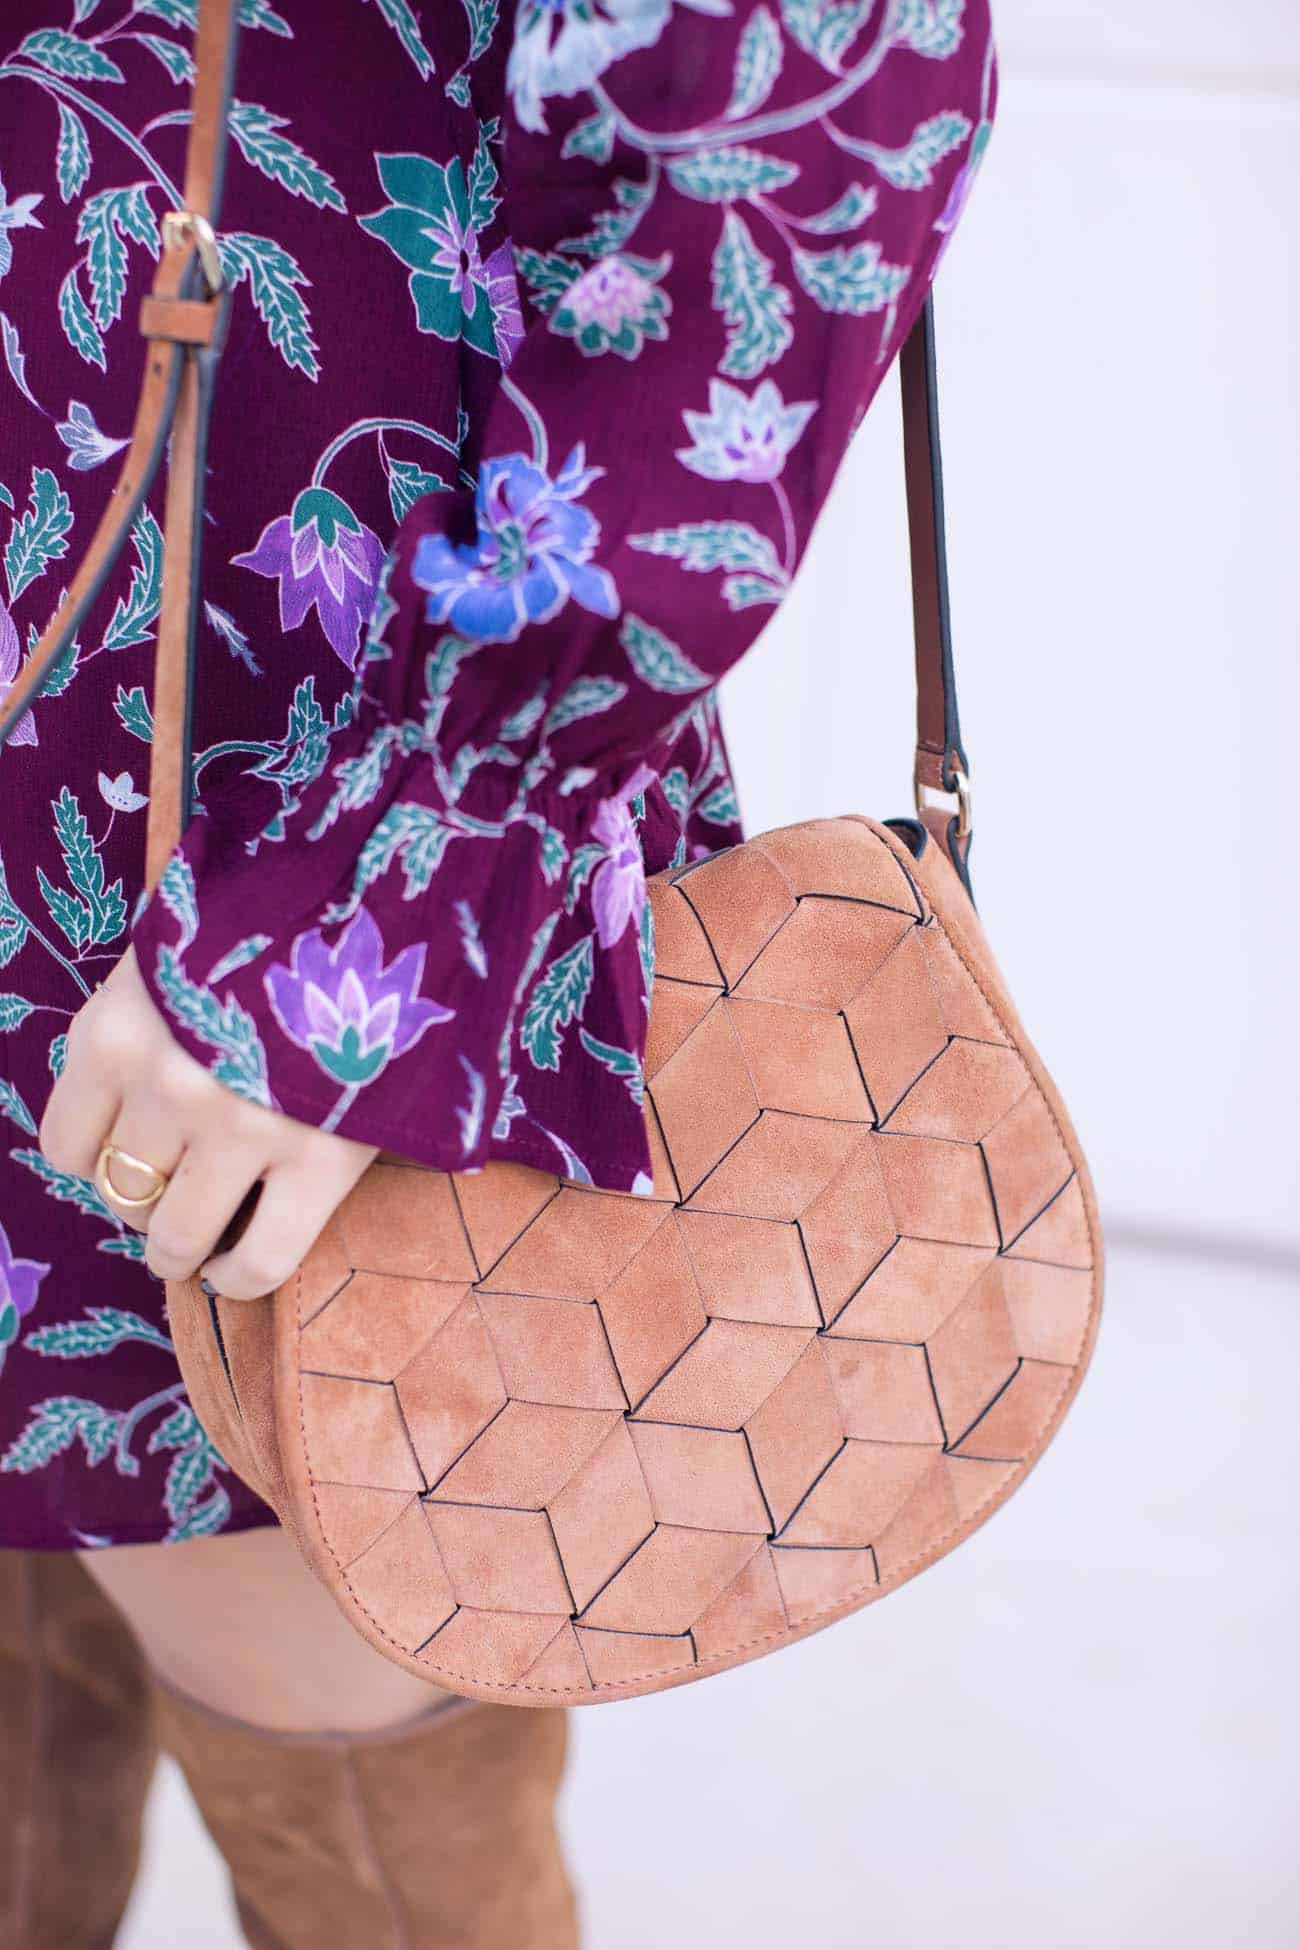 welded bag, crossbody bags, floral dress, - My Style Vita @mystylevita